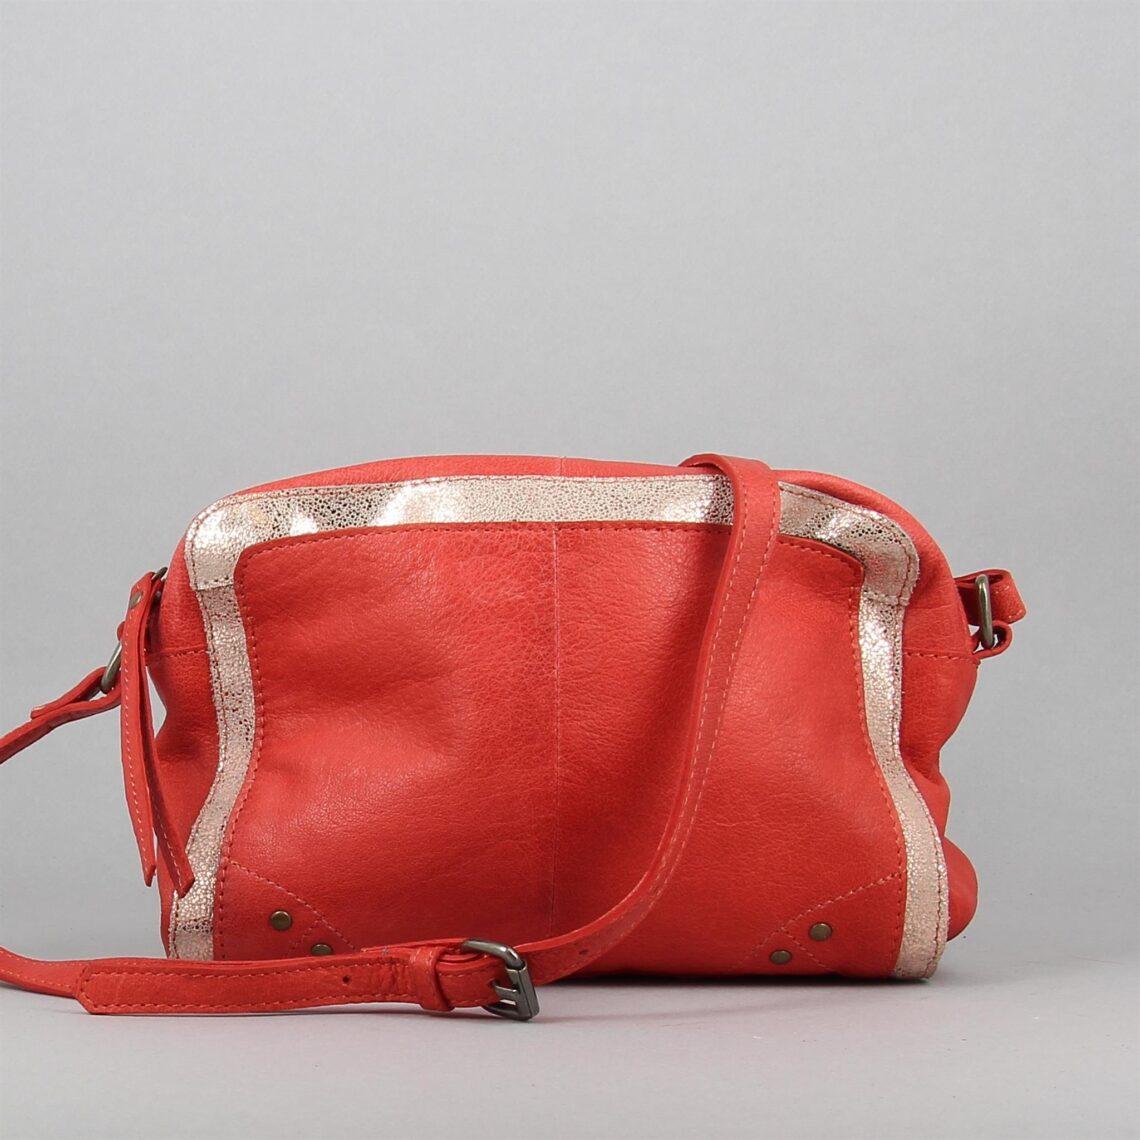 mandarin-rouge-1376260-0.jpg